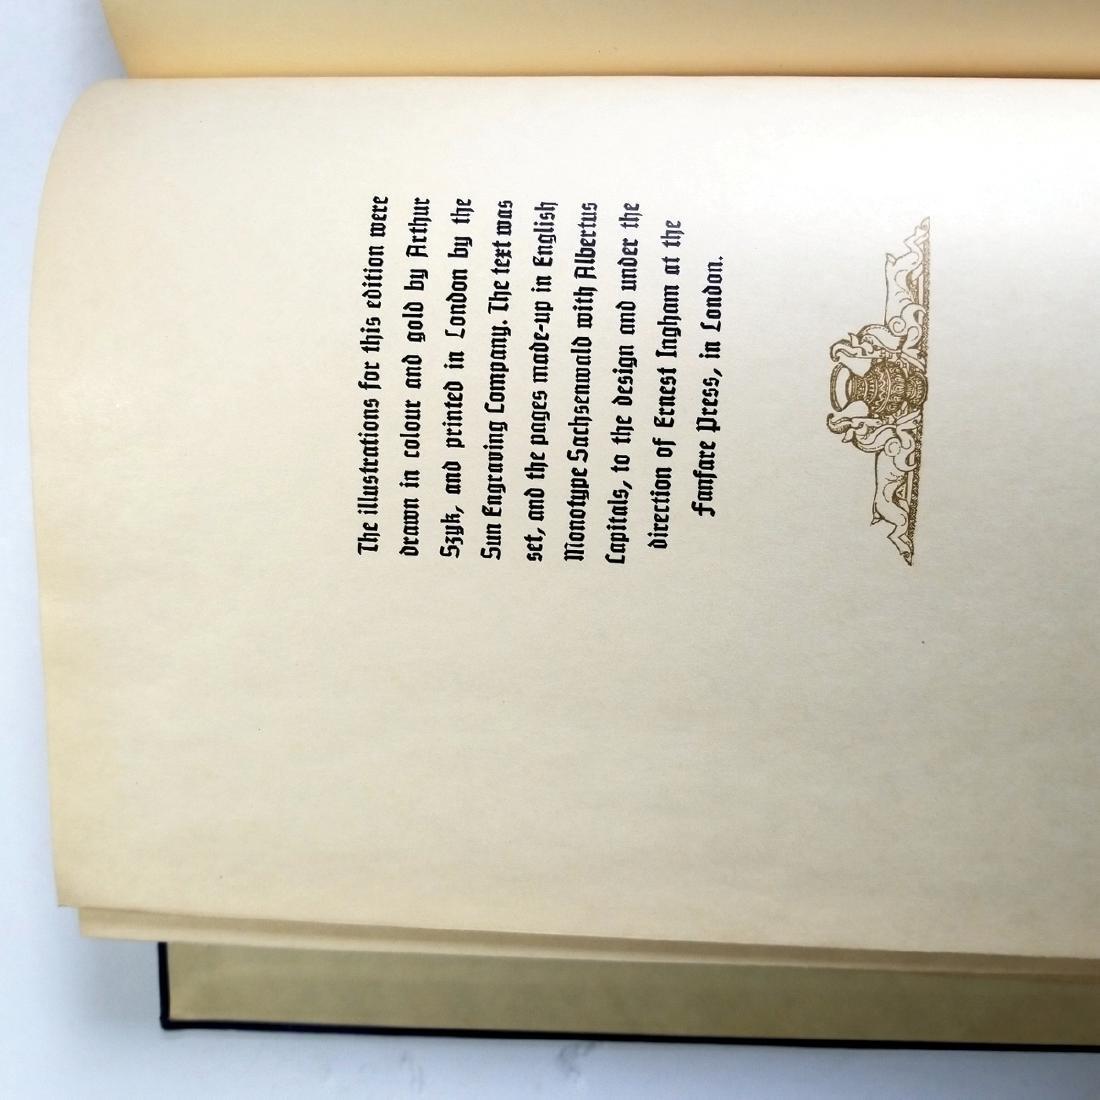 Arthur Szyk Inscribed Rubaiyat of Omar Khayyam 1940 1Ed - 4